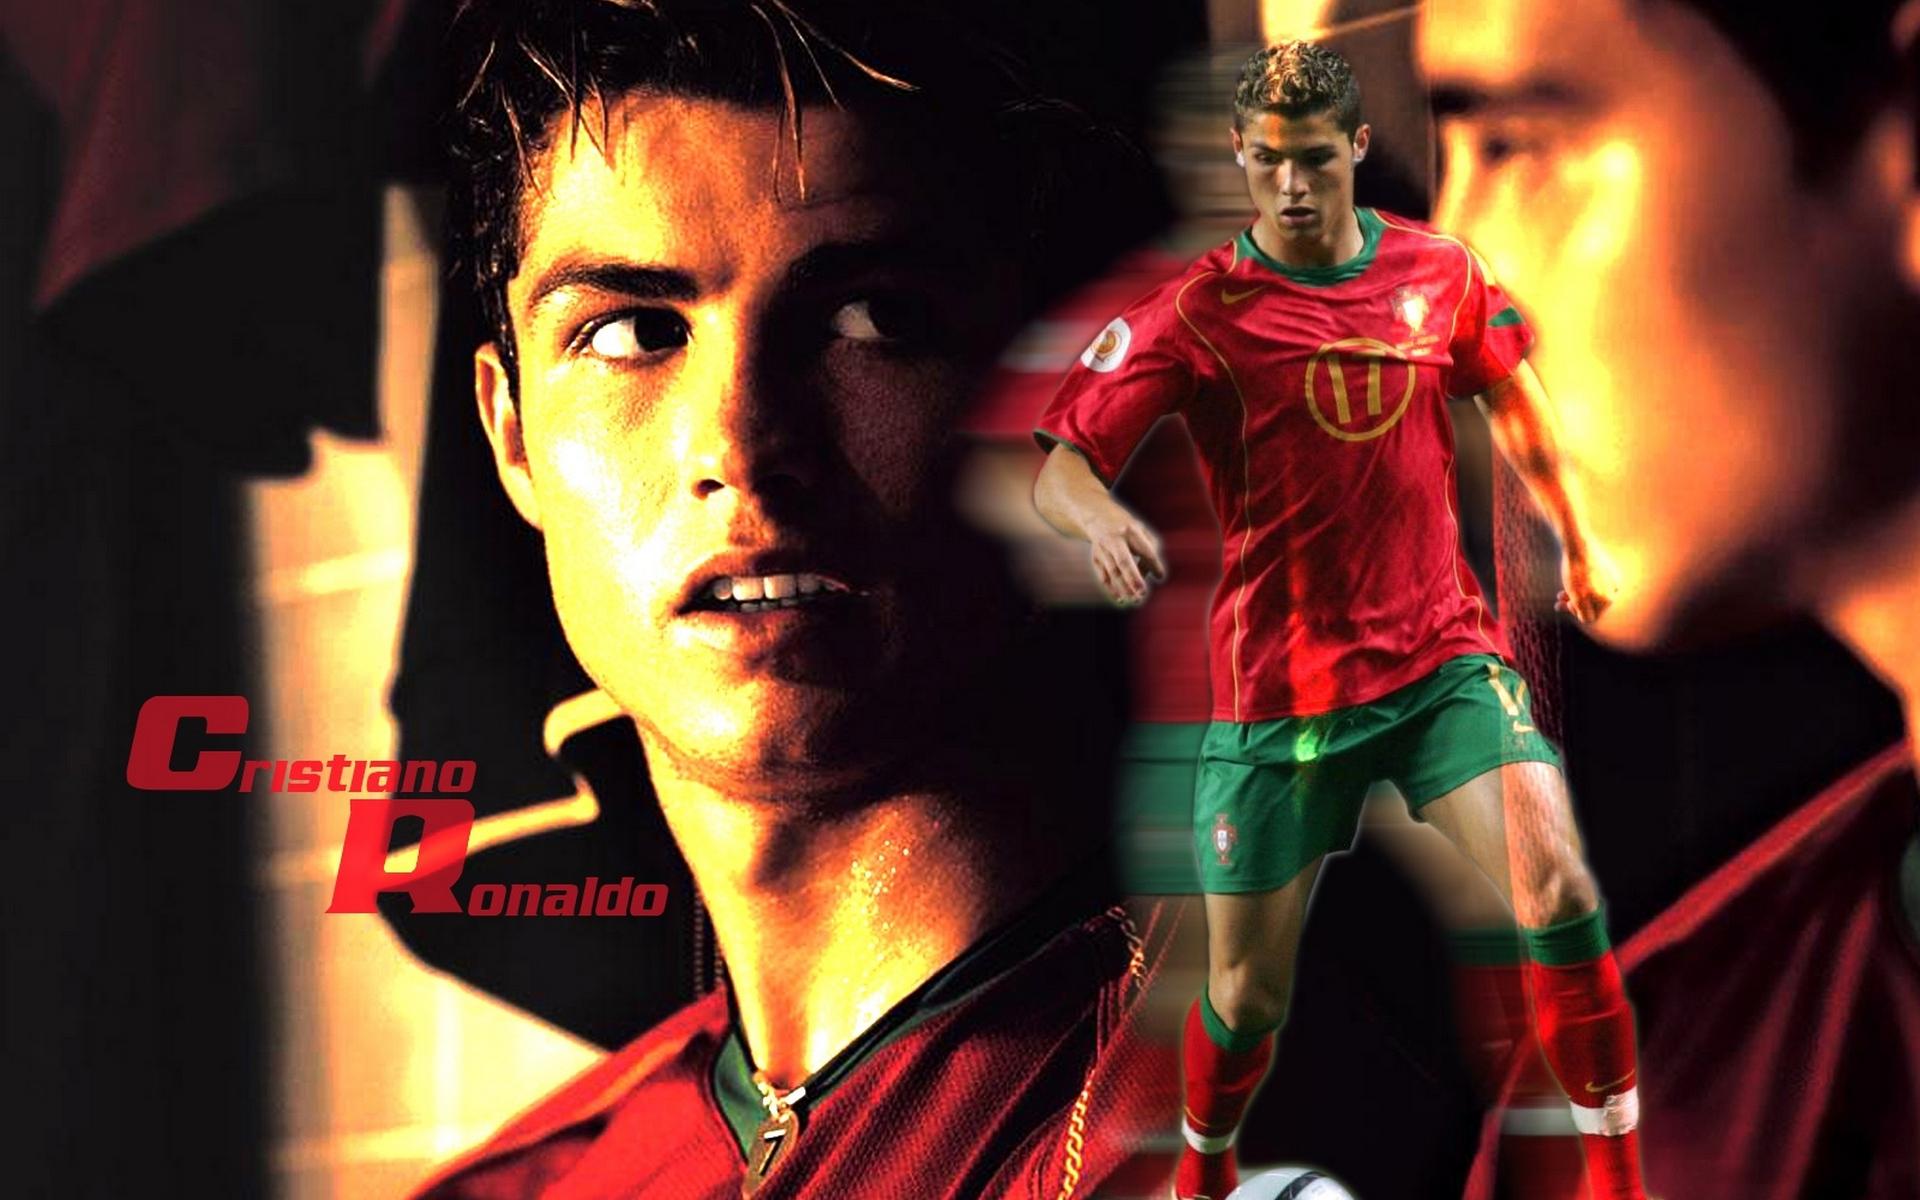 Обои Криштиану Роналду, футболист, форма, надпись